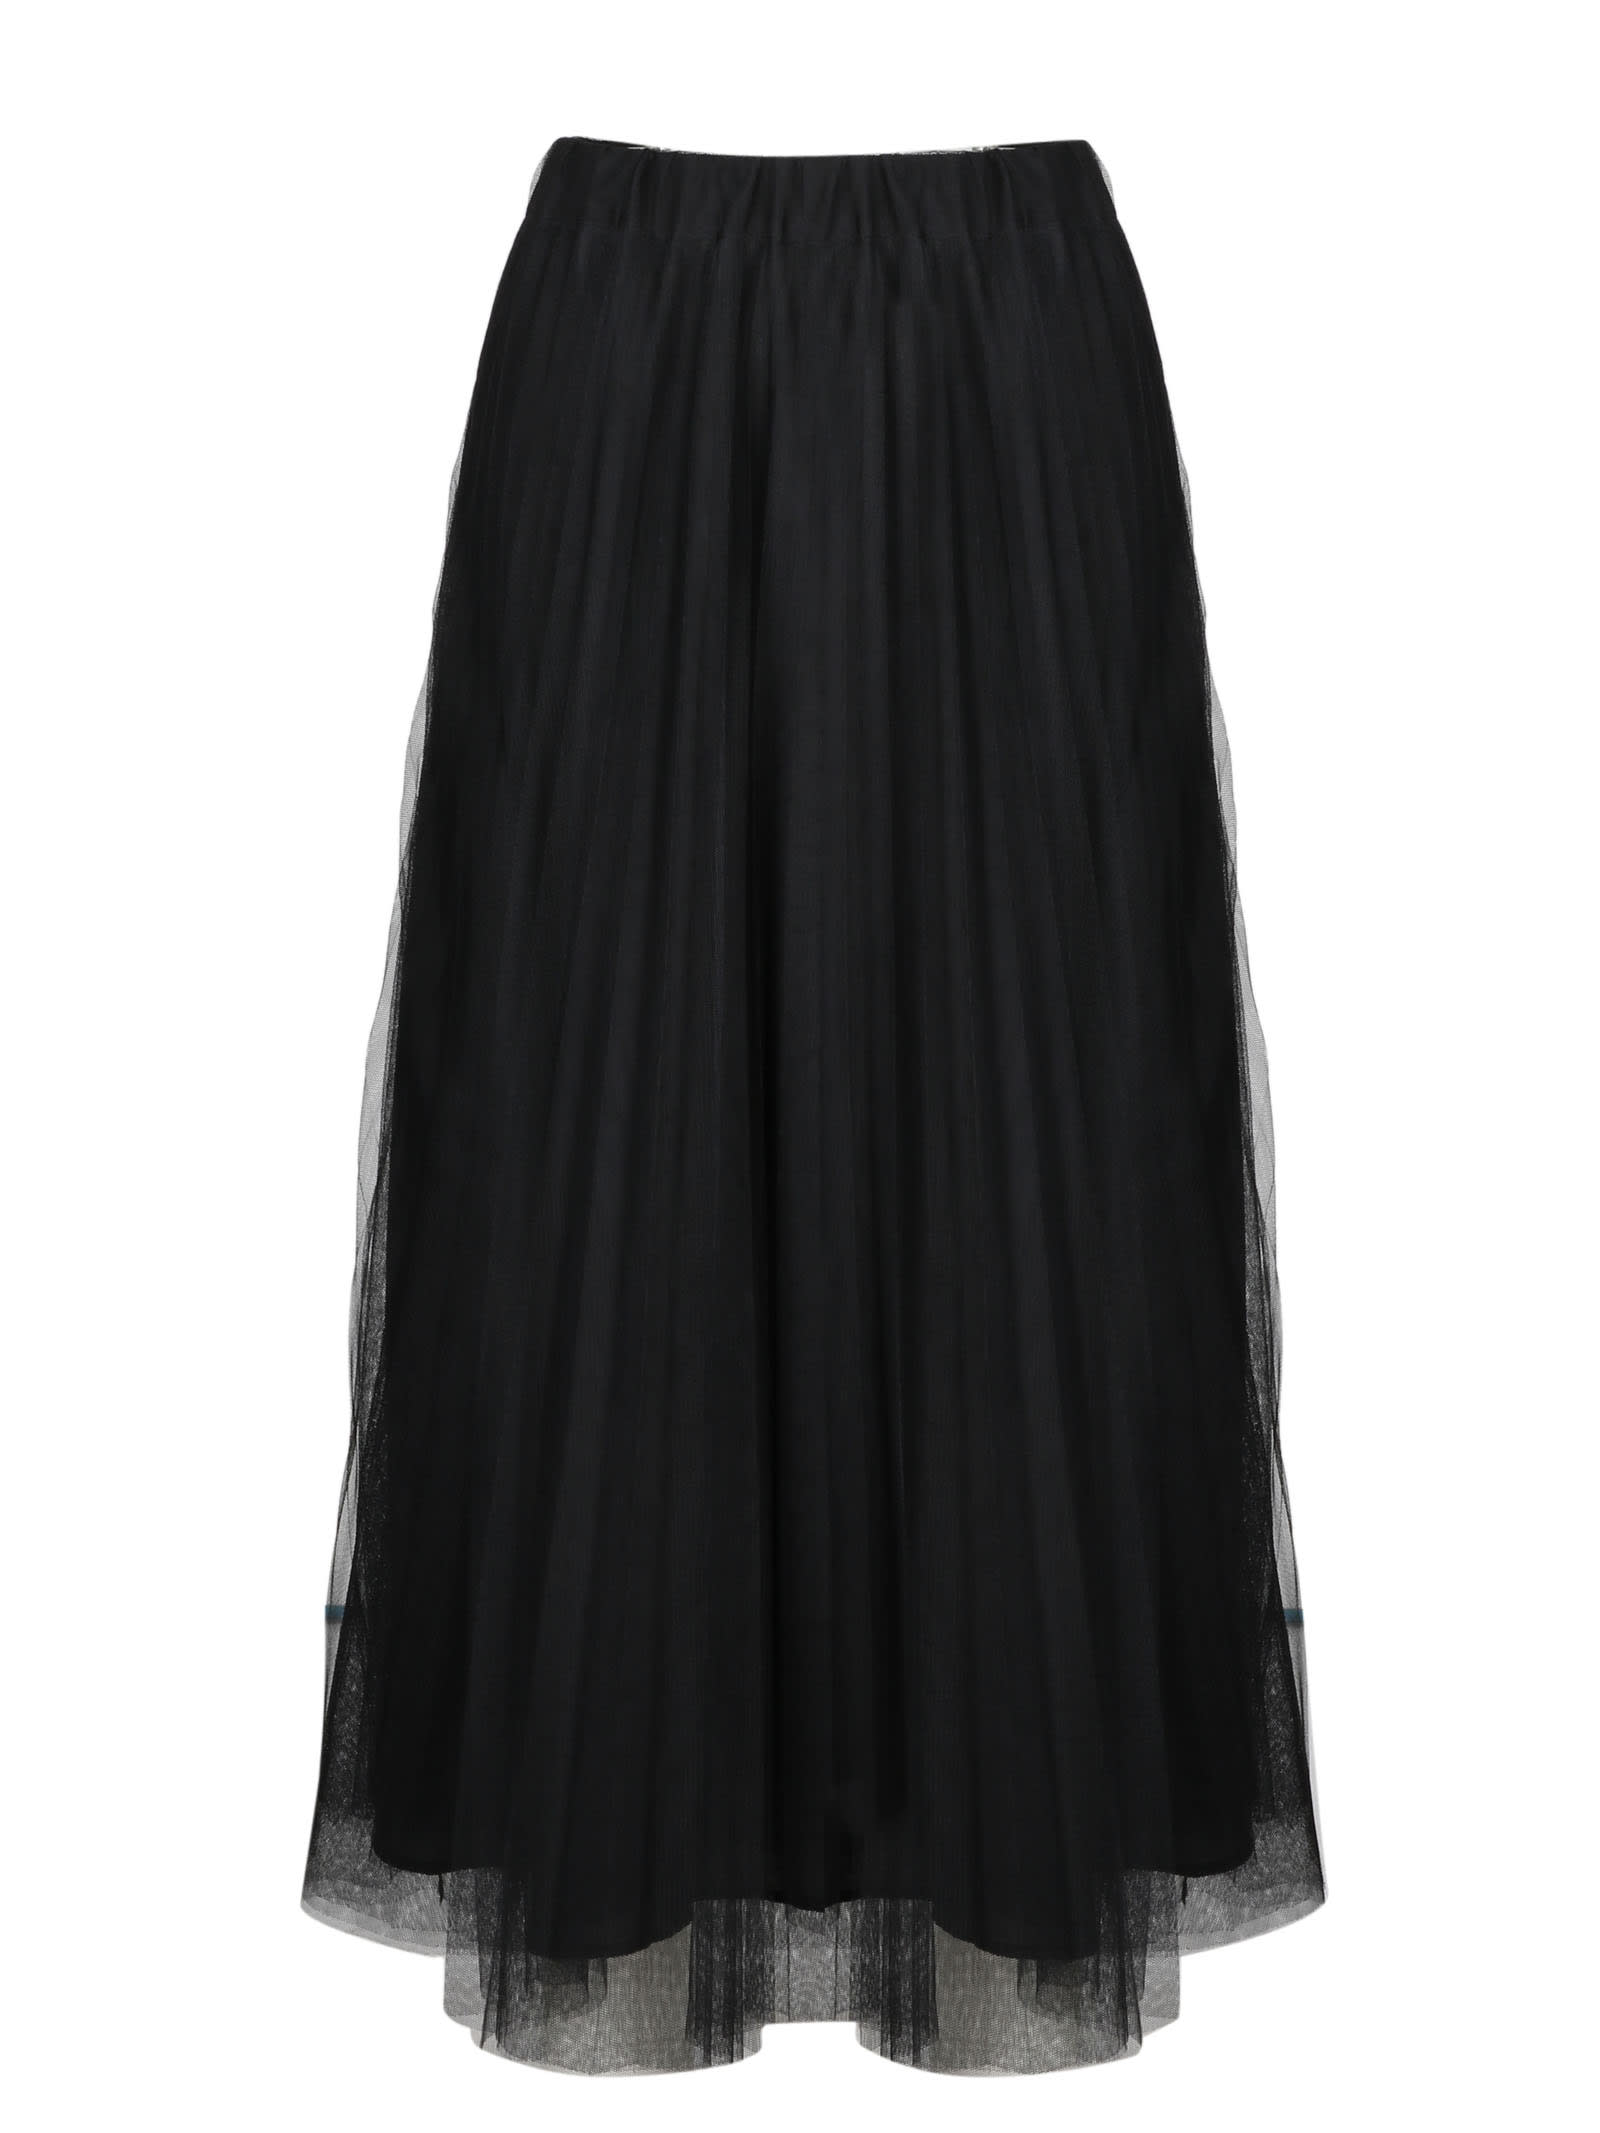 Parosh Parallel Pleated Skirt